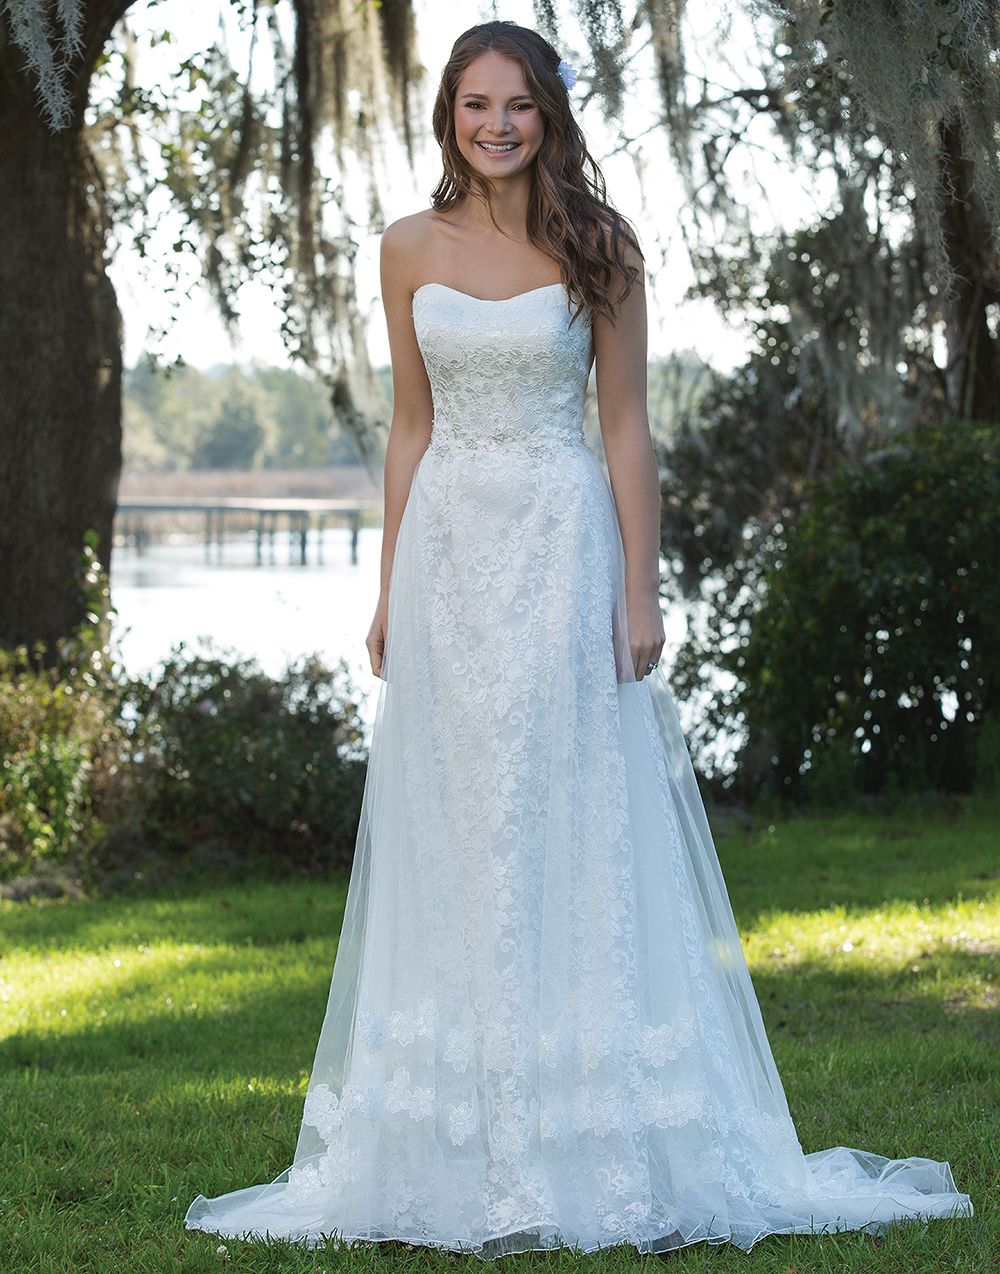 Colorful Wedding Dresses Orlando Fl Inspiration - All Wedding ...